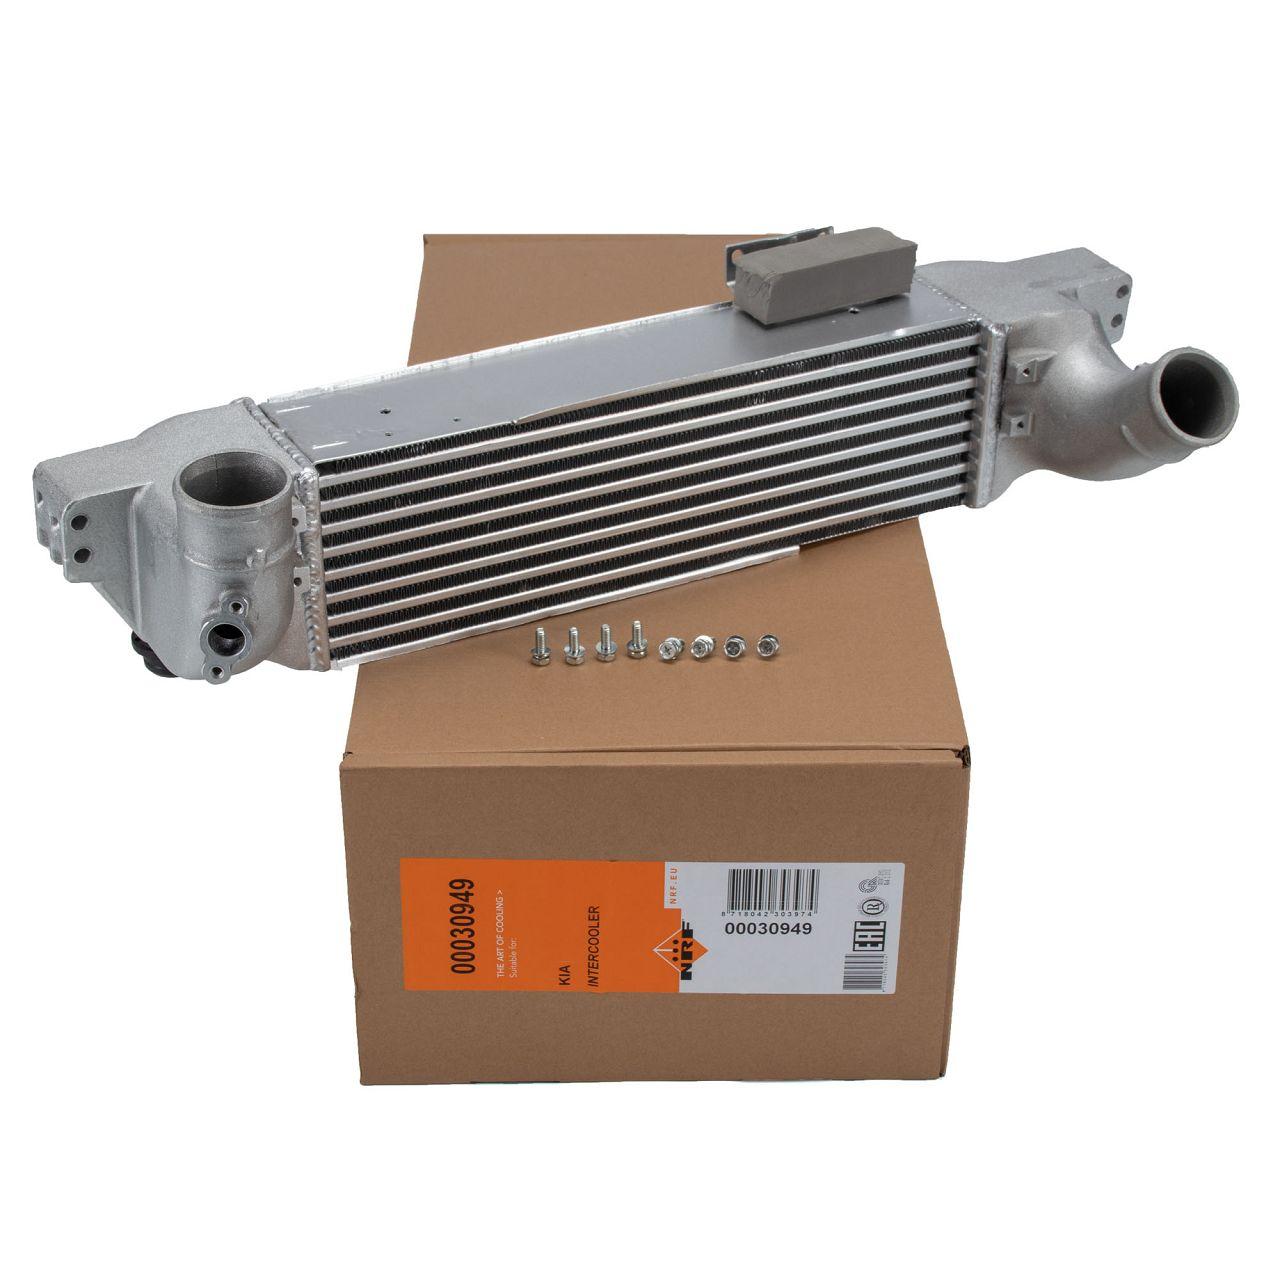 NRF Ladeluftkühler Turbo Ladeluft-Kühler für KIA SORENTO I JC 2.5CRDi 281904A470